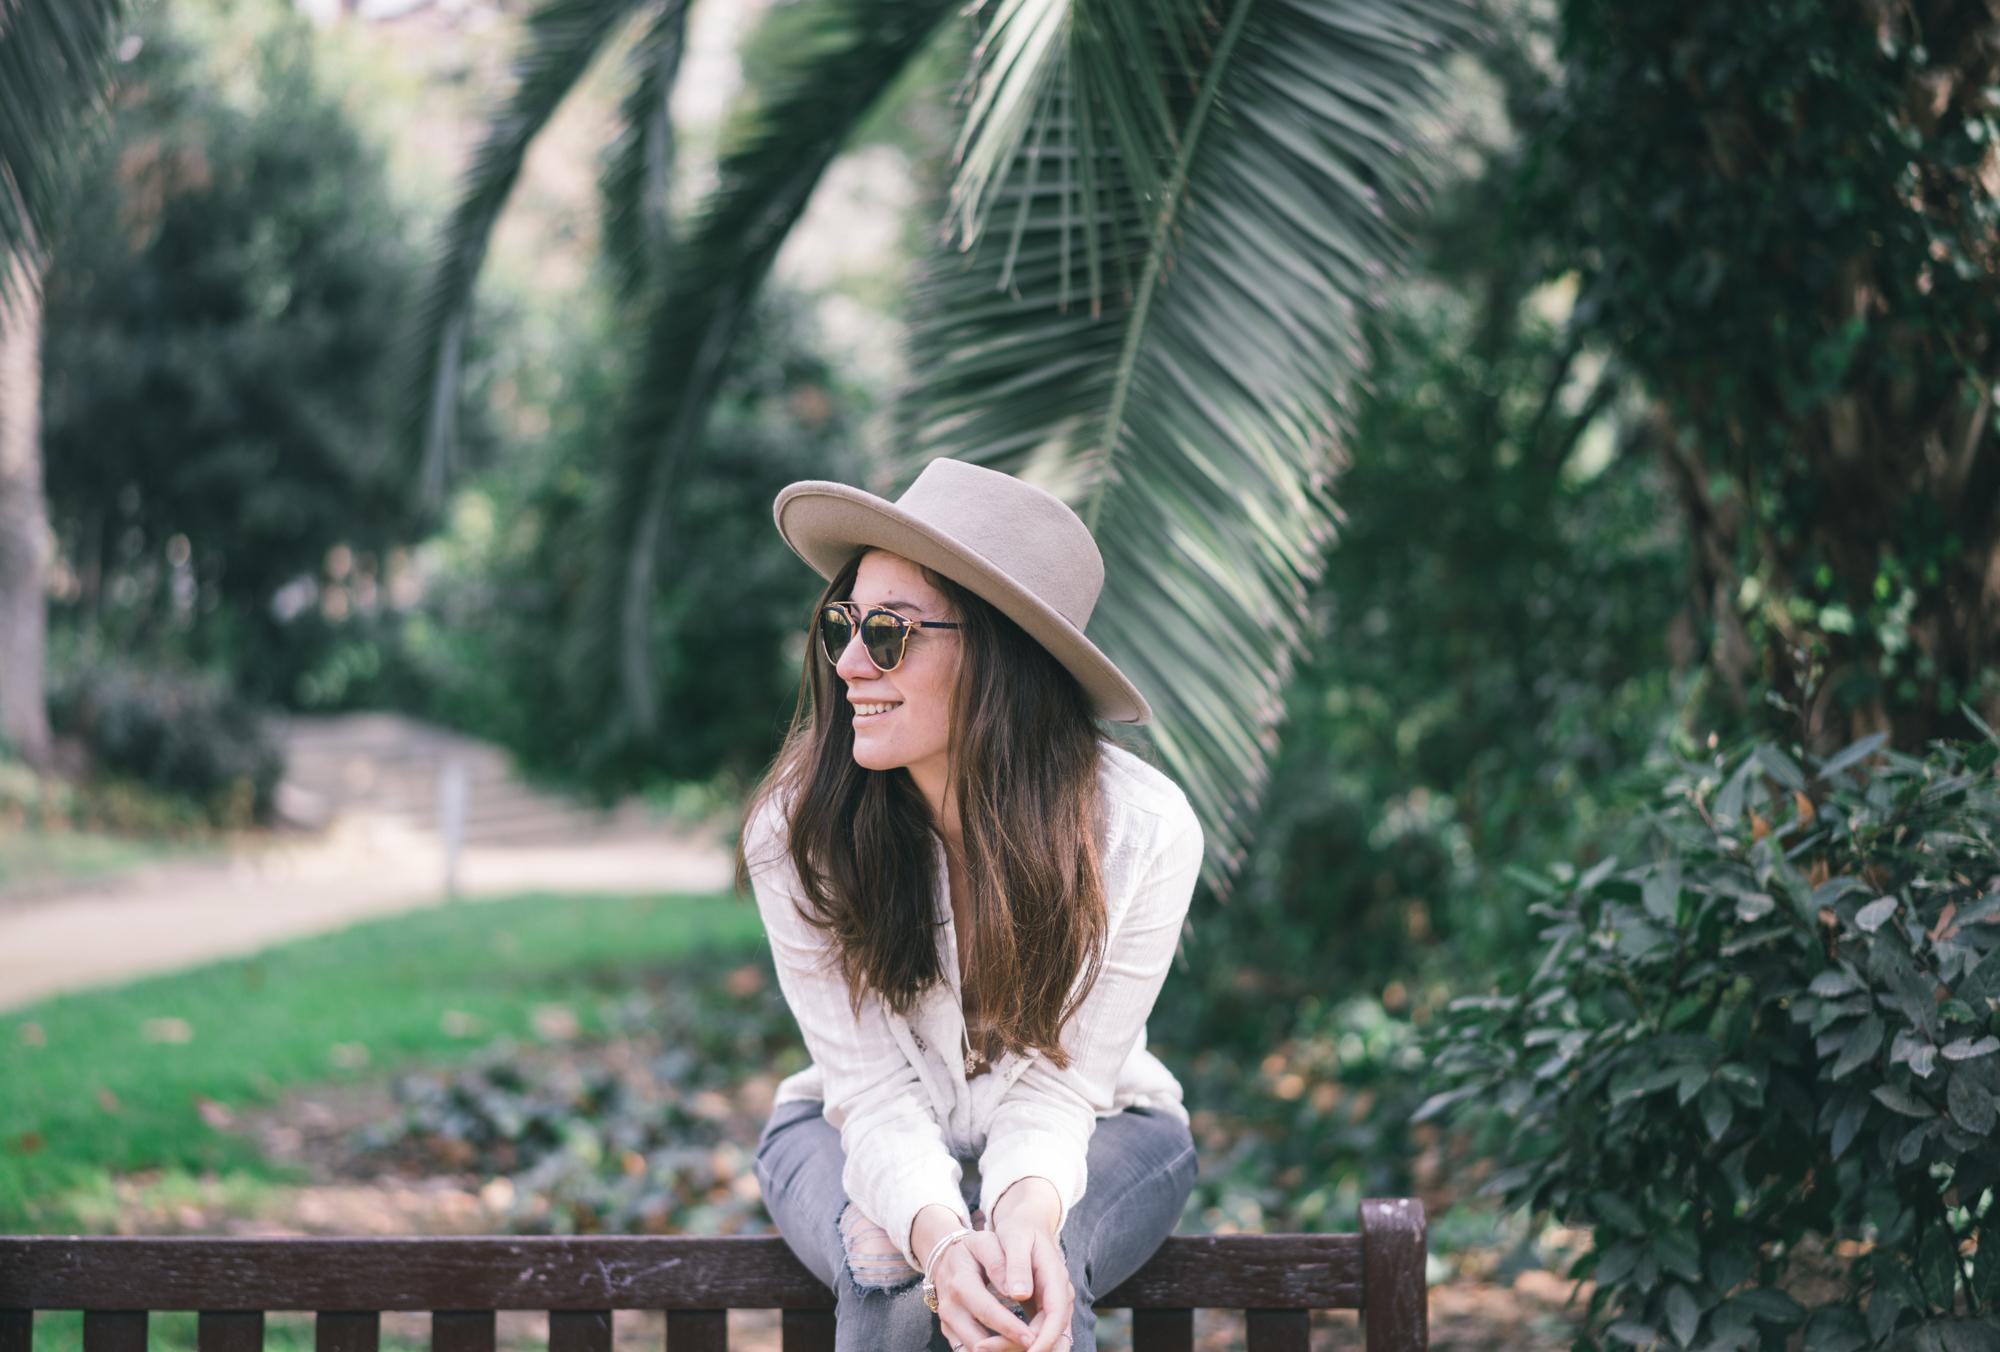 billur saatci, off ne giysem, lifestyle blogger, turkish style blogger, pandora, barcelona, turo parc, mavi, comptoir des cotonniers, vintage, alexander wang, free people, dior, moorer